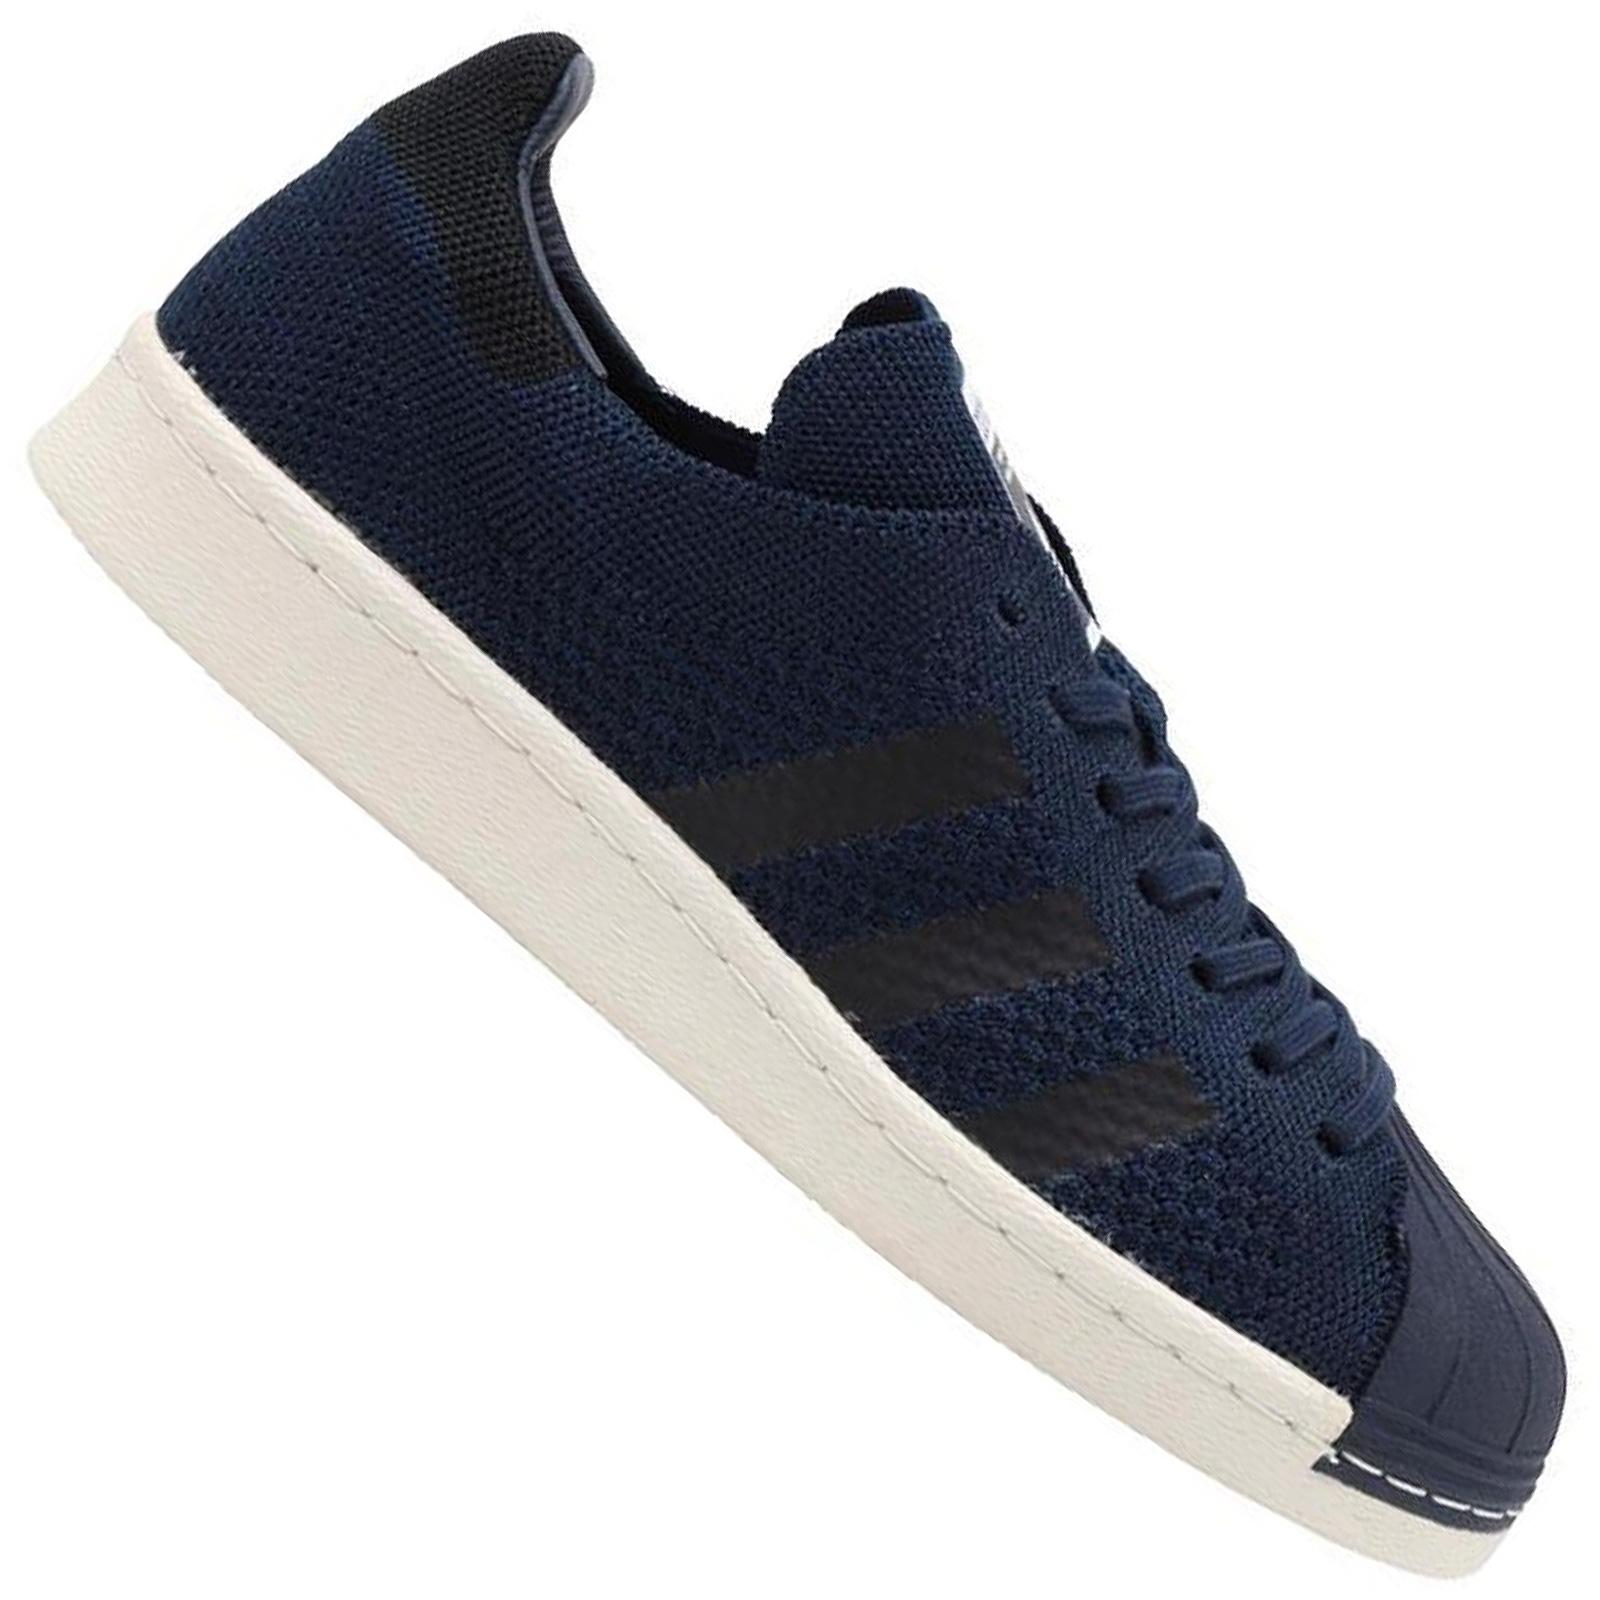 Details about Adidas Originals Superstar 80s Primeknit Sst Pk Men's Sneakers Shoes Navy